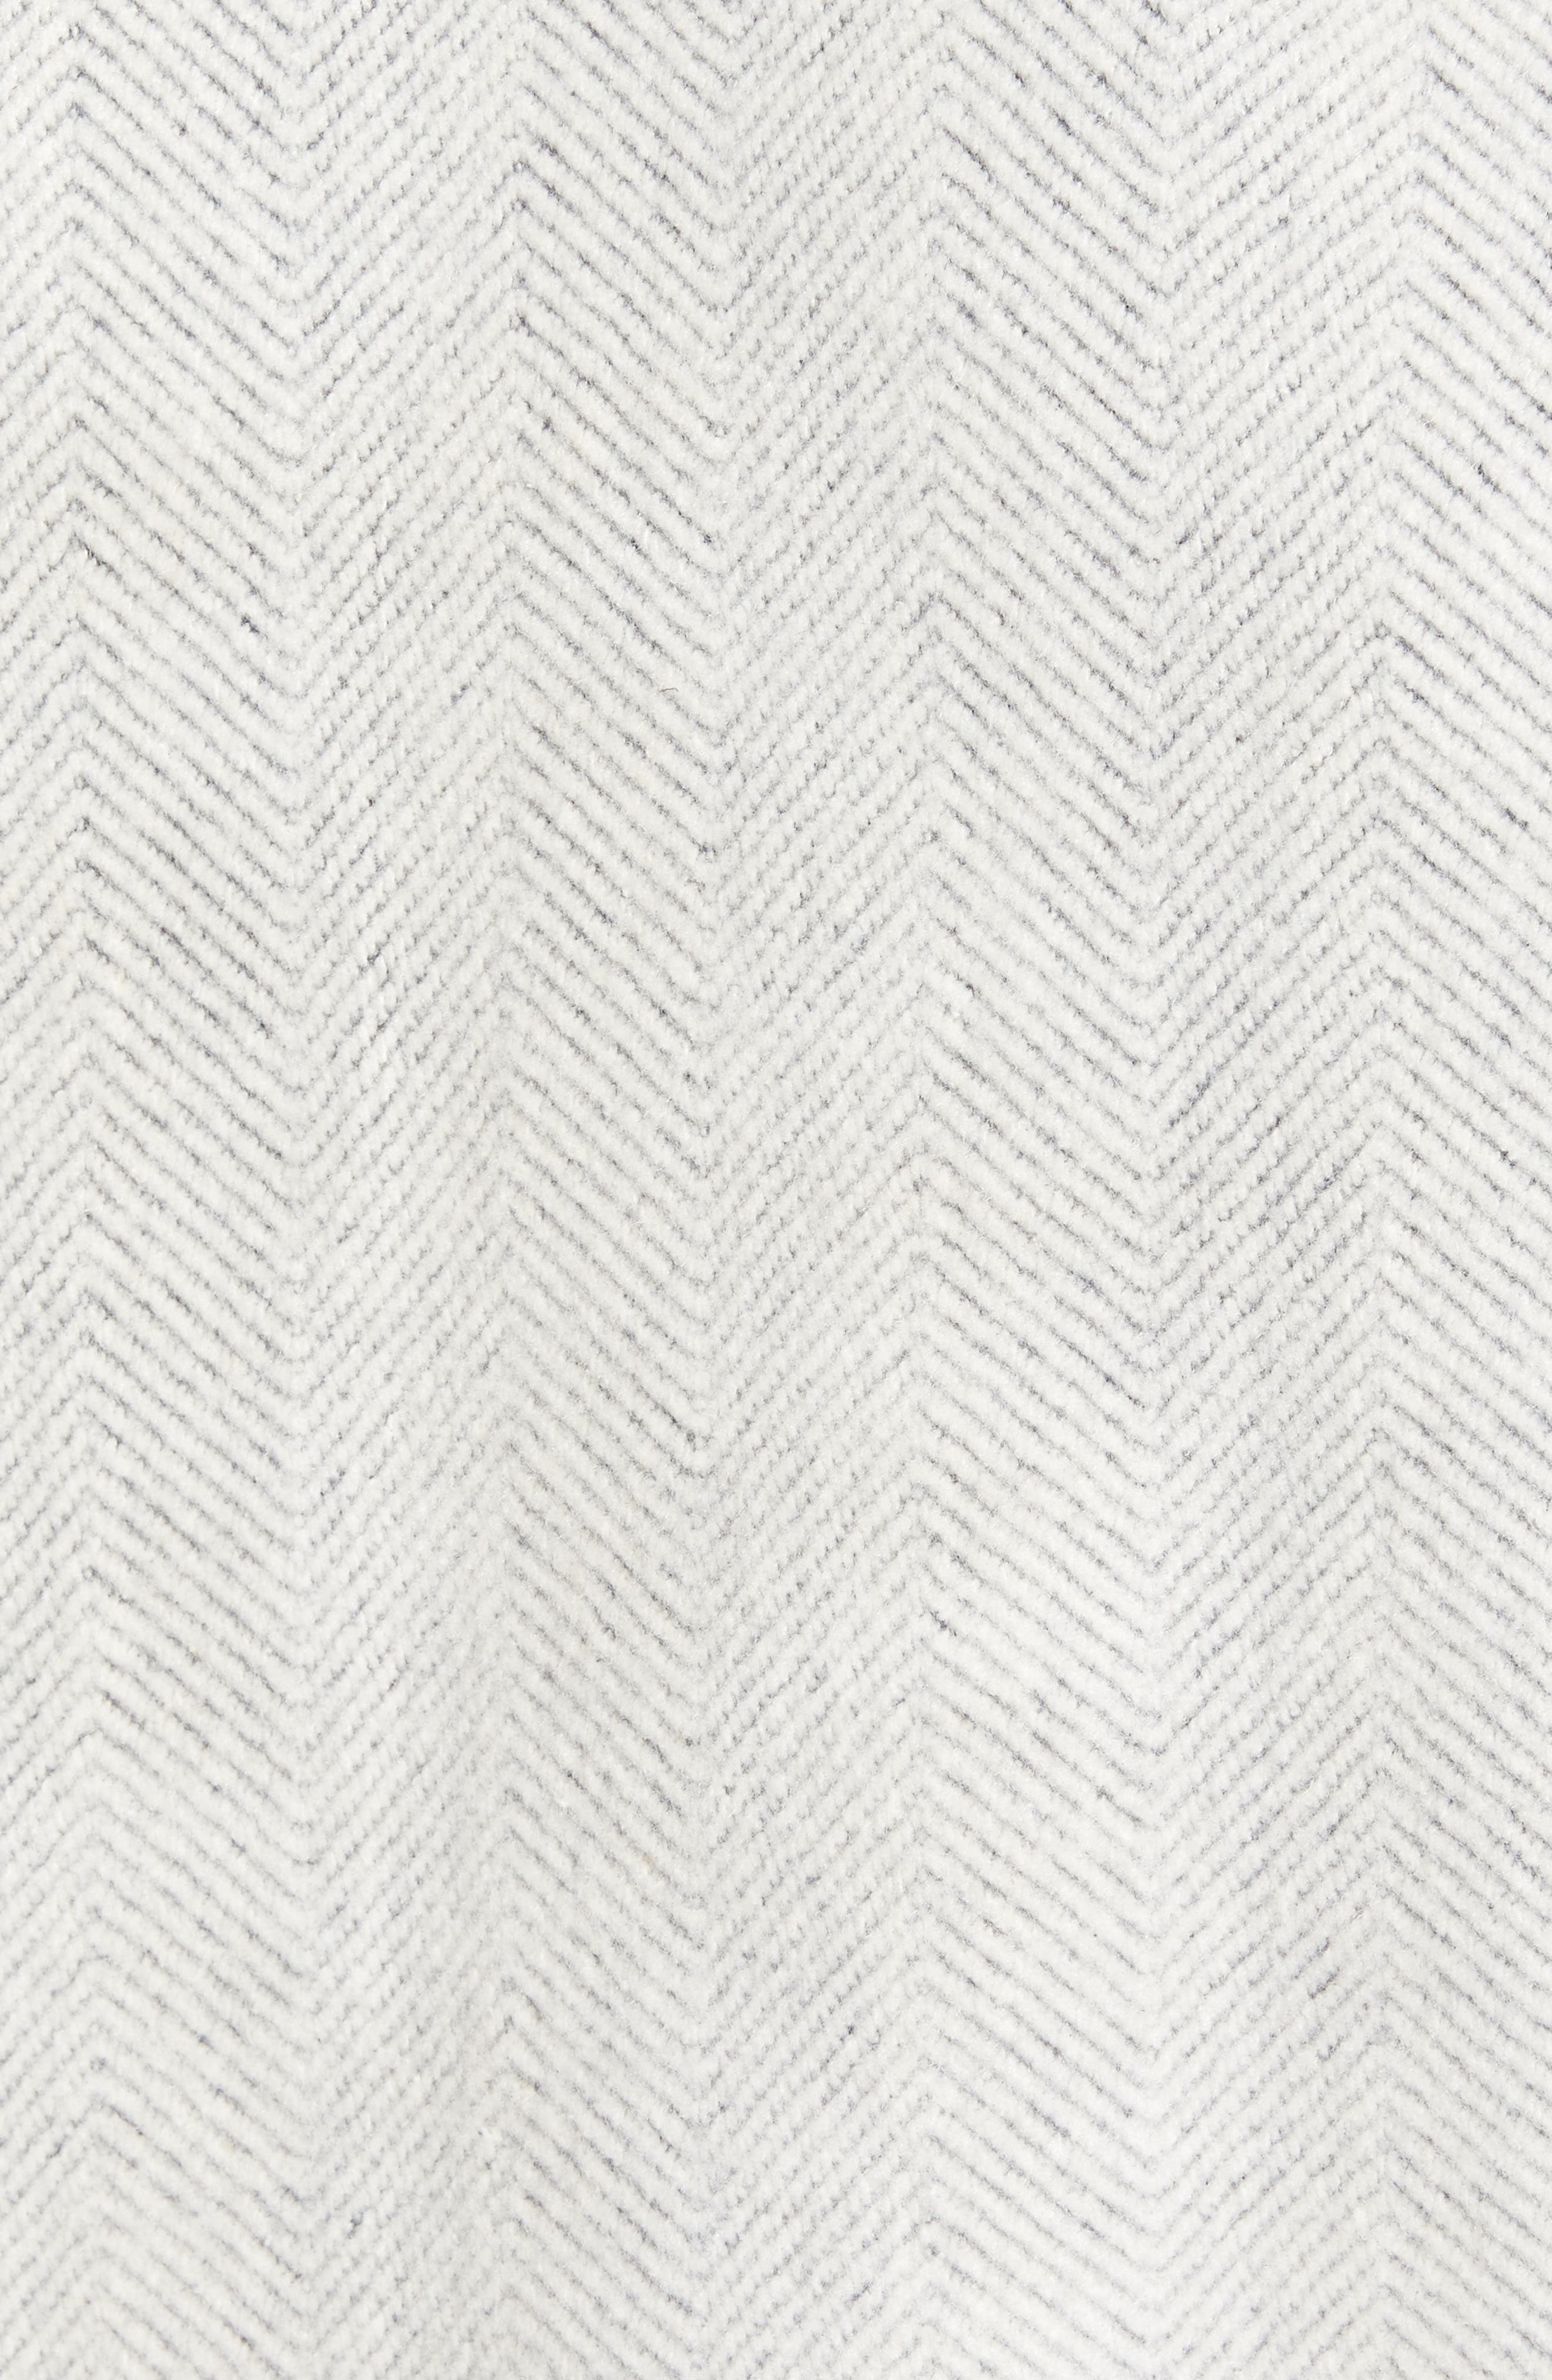 Brushed Fleece Sweatshirt,                             Alternate thumbnail 5, color,                             Ivory Egret